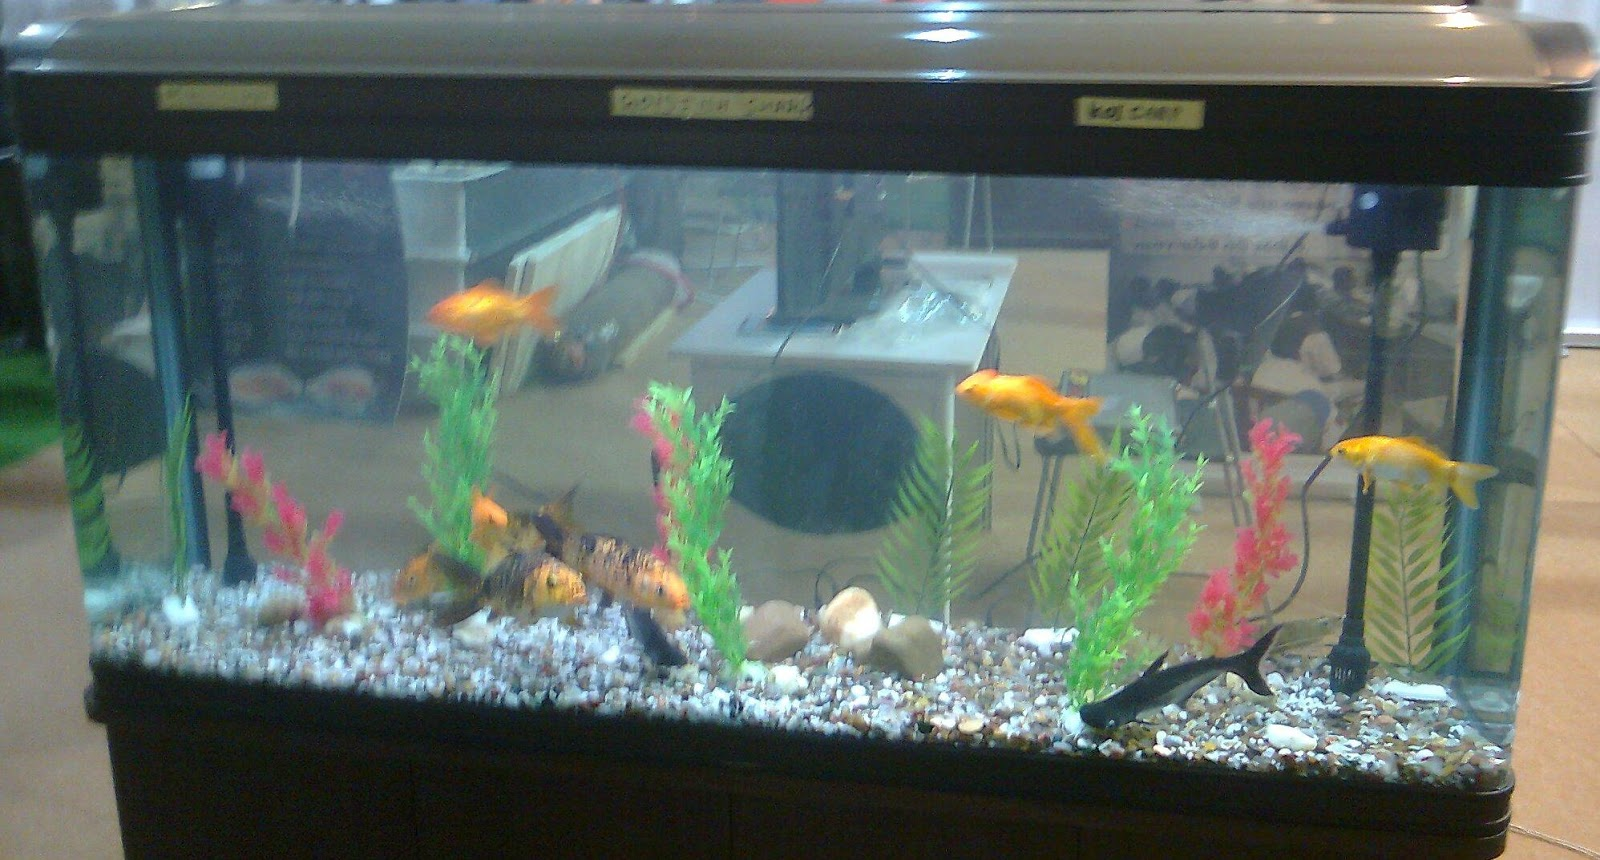 Fish price for aquarium in india - Fish As Pets Pet Shop Ahmedabad Feedage 18234914